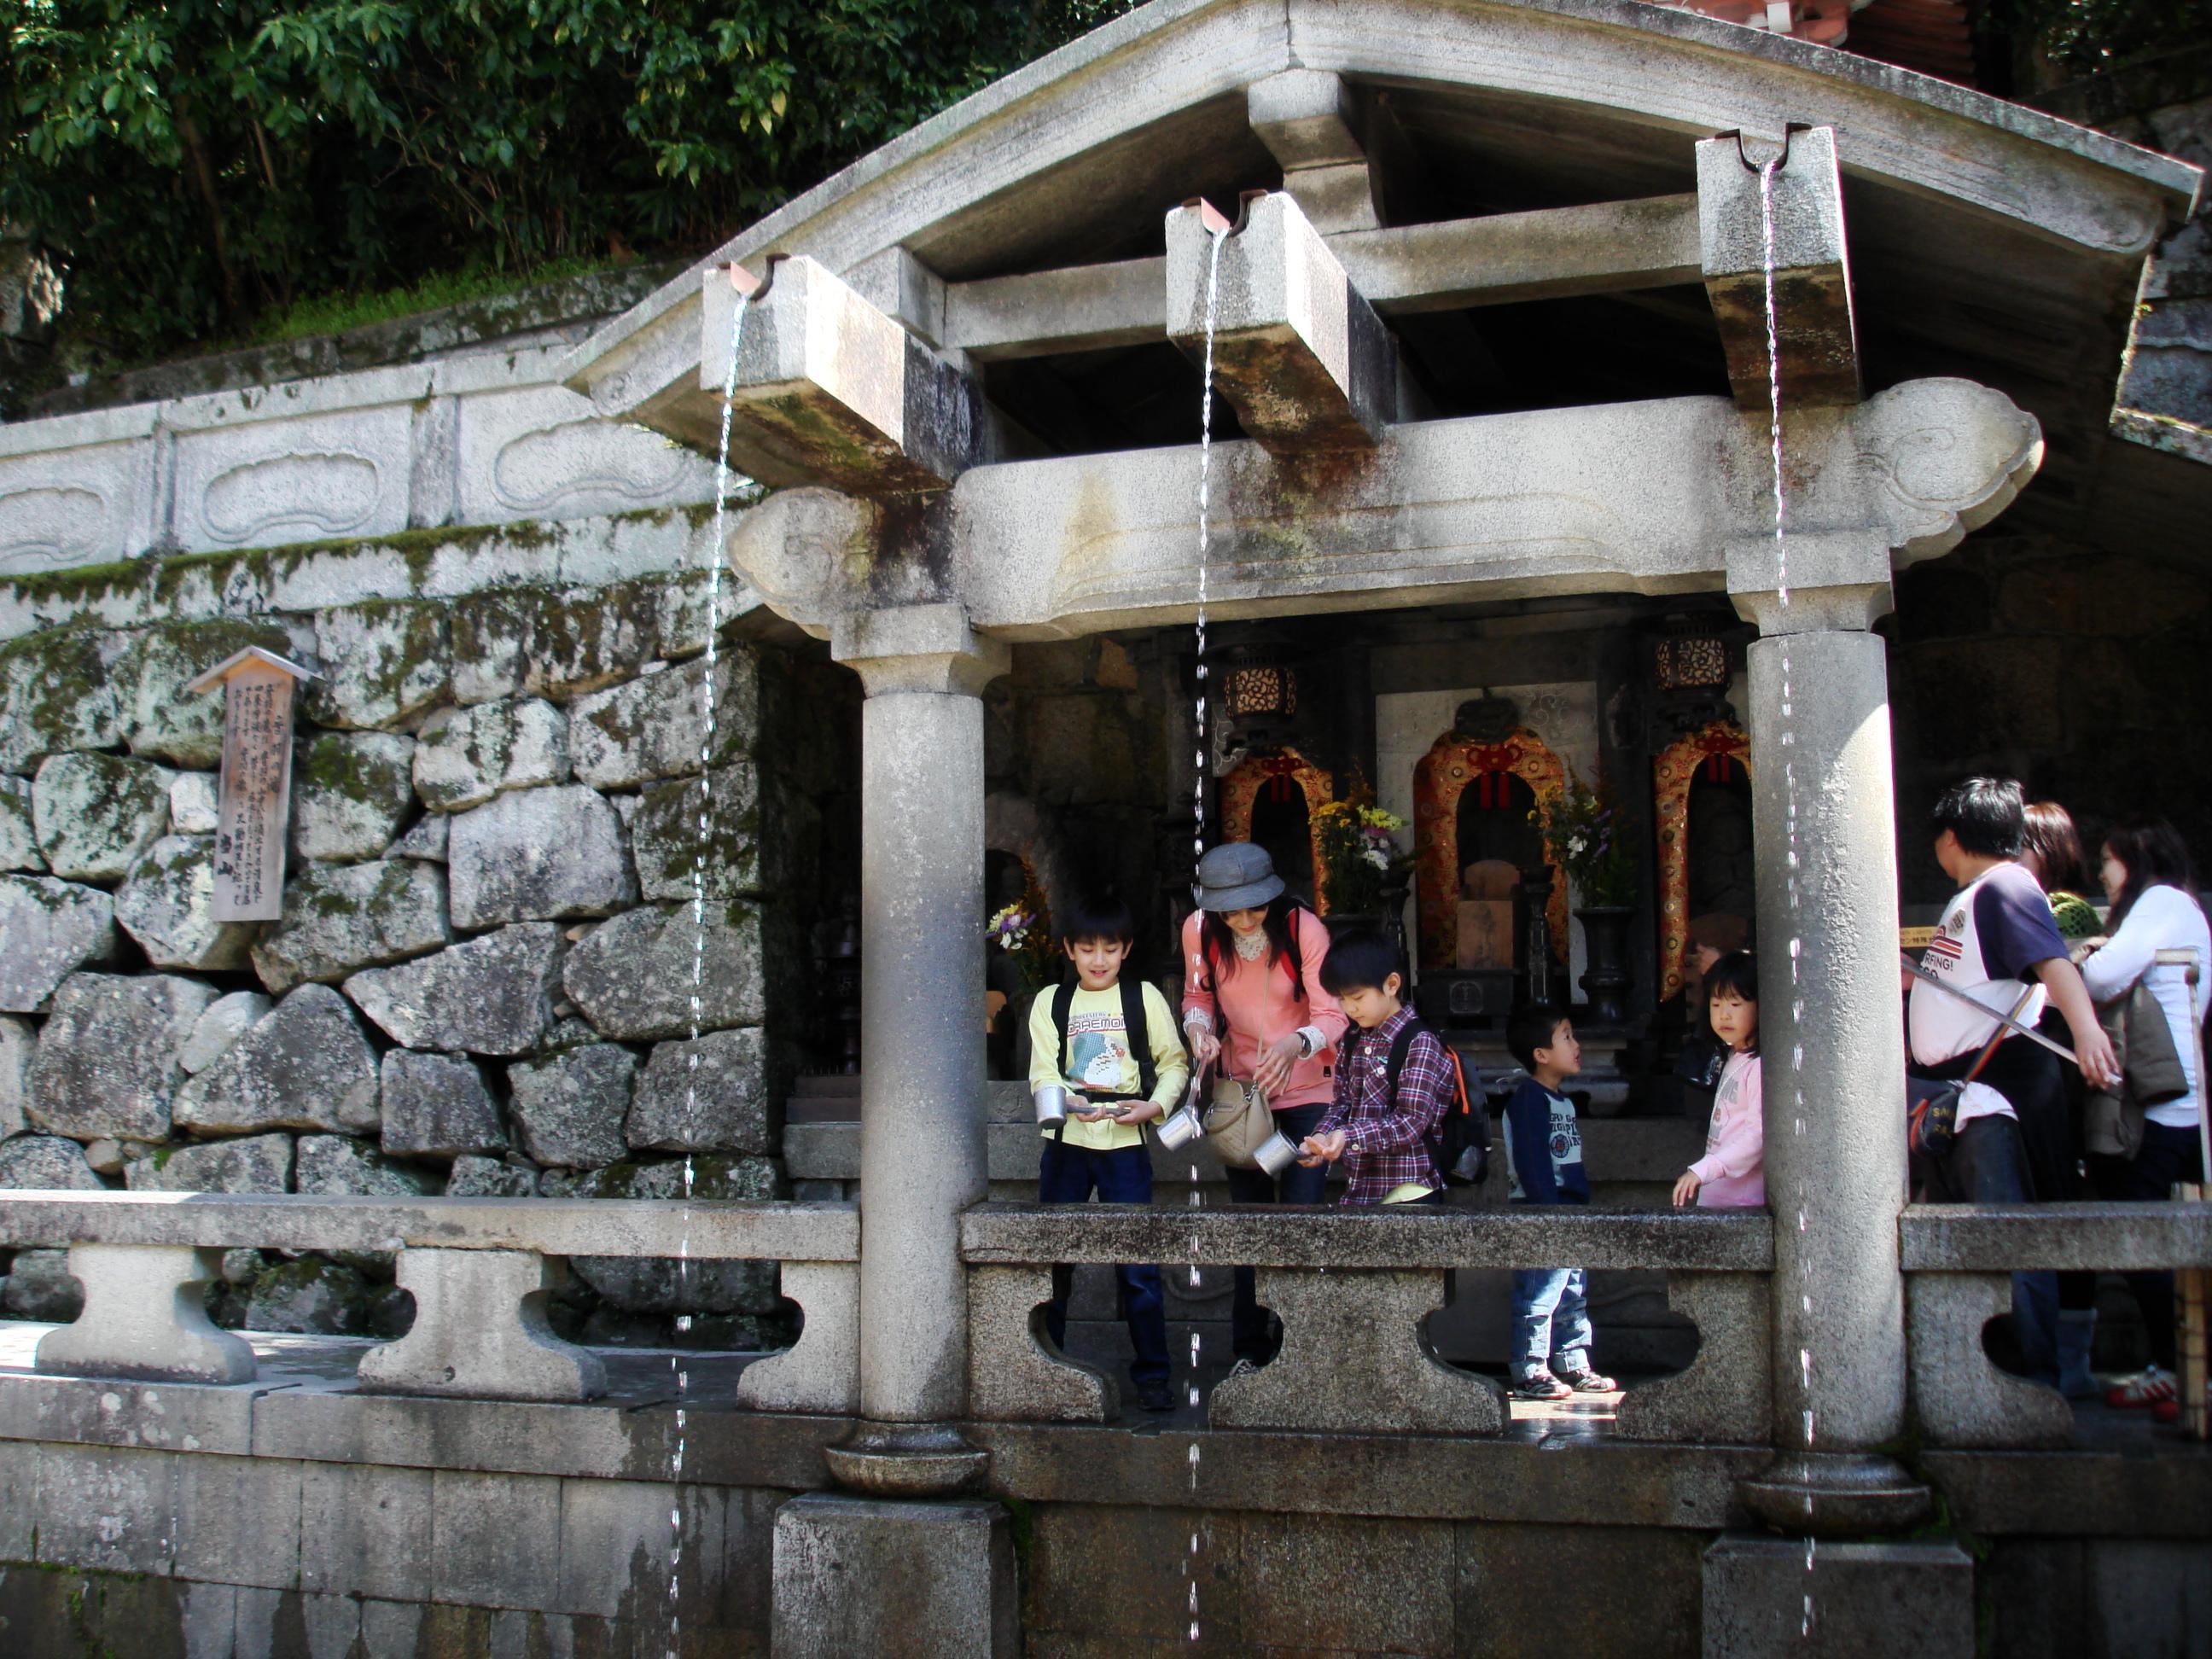 Otowa Waterfall at Kiyomizudera Temple. Credit: Travis Rigel Lukas Hornung. Licensed under CC.